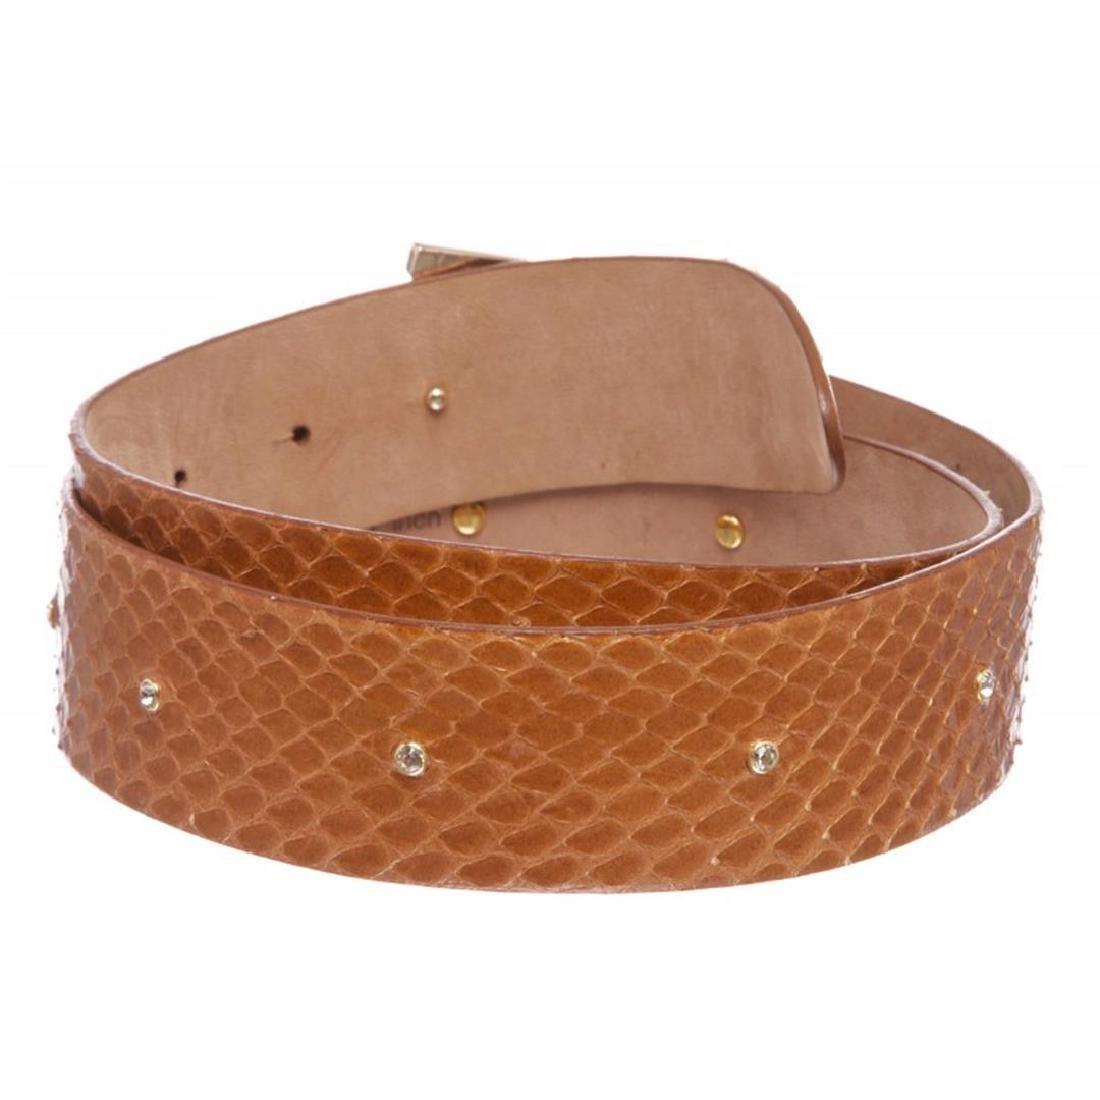 Dolce & Gabbana Brown Snakeskin Rhinestone Buckle Belt - 4